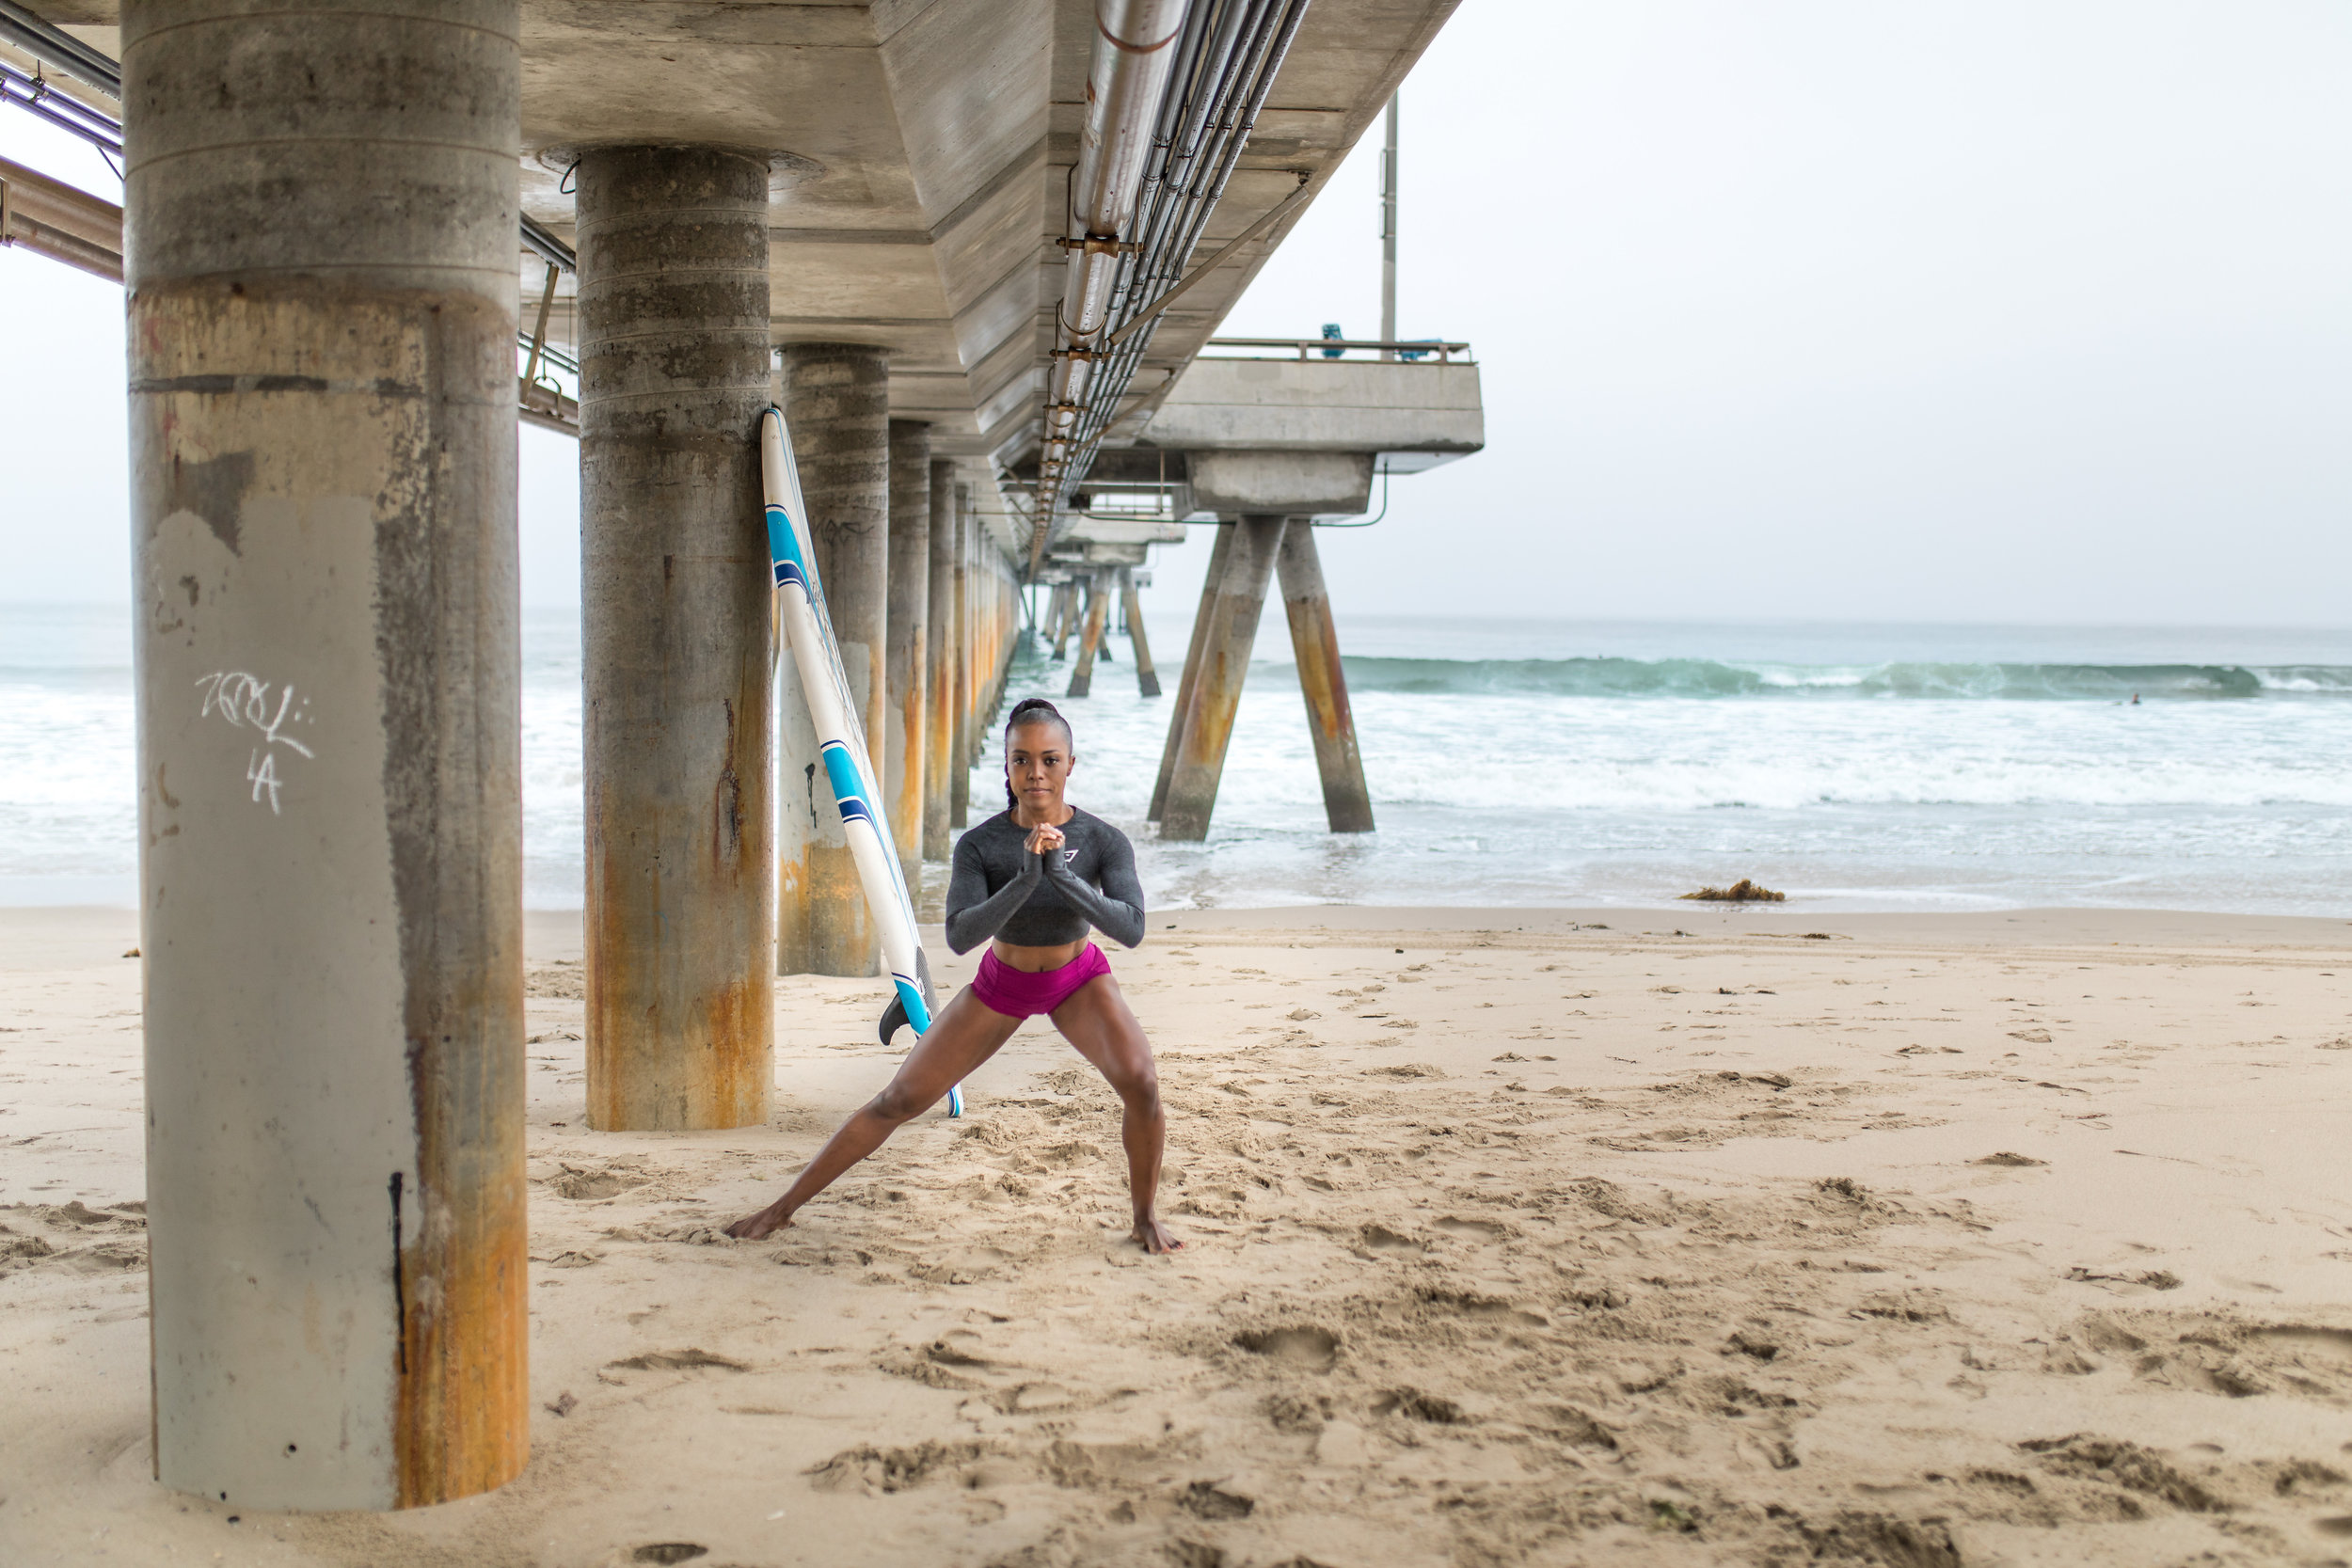 Livestrong_Surf Workout-15.JPG